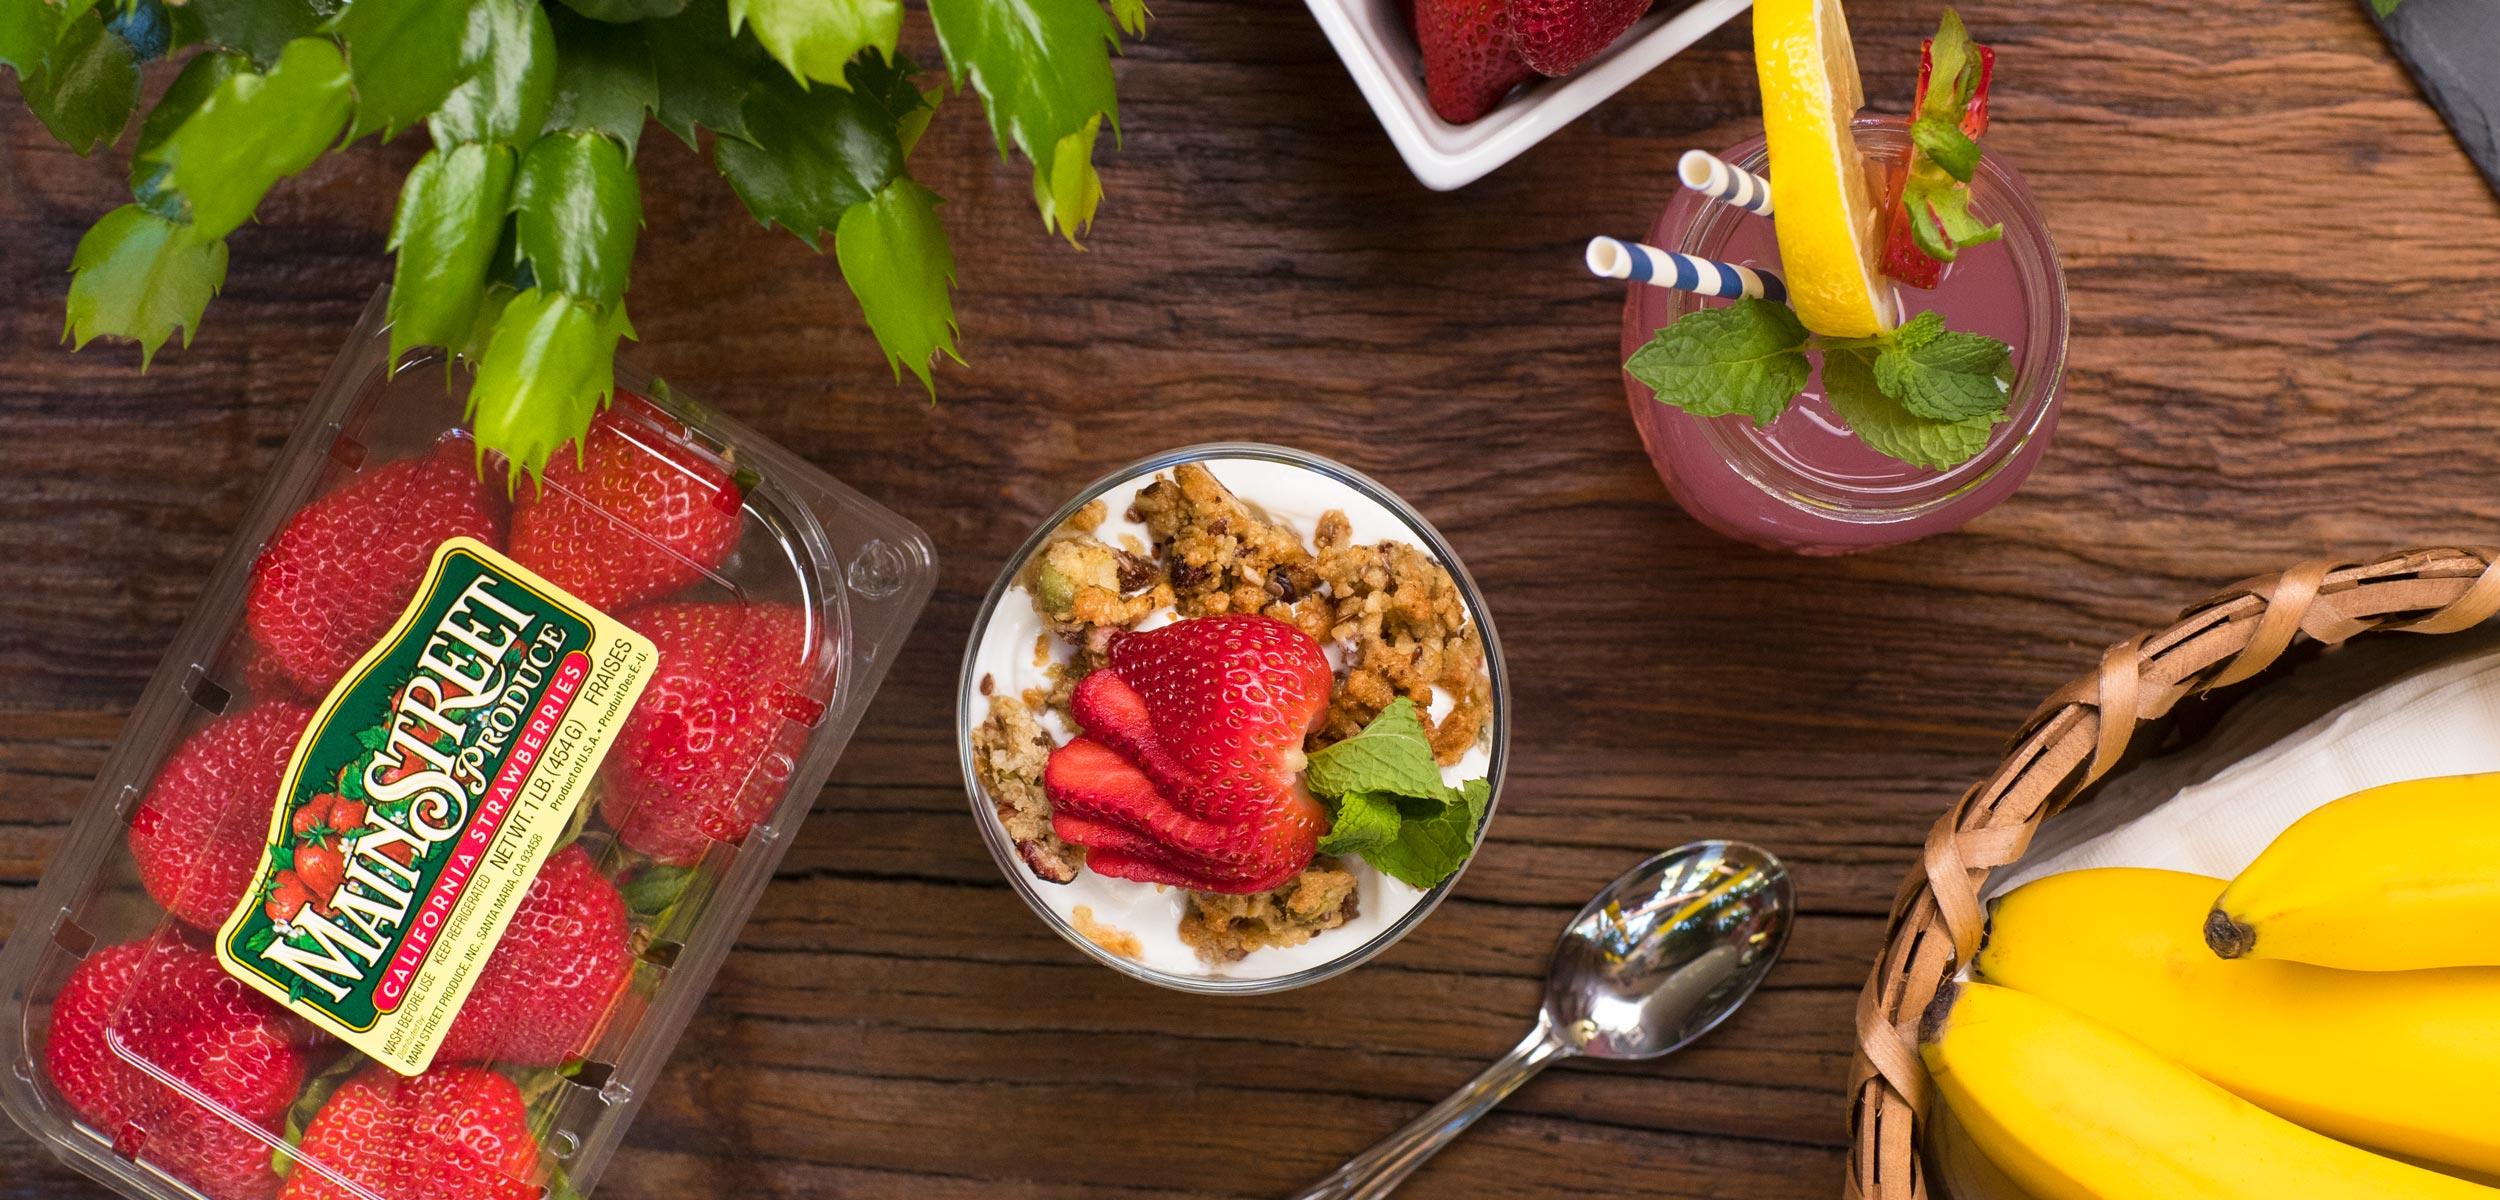 Main-Street-Produce-Strawberries-Lifestyle.jpg